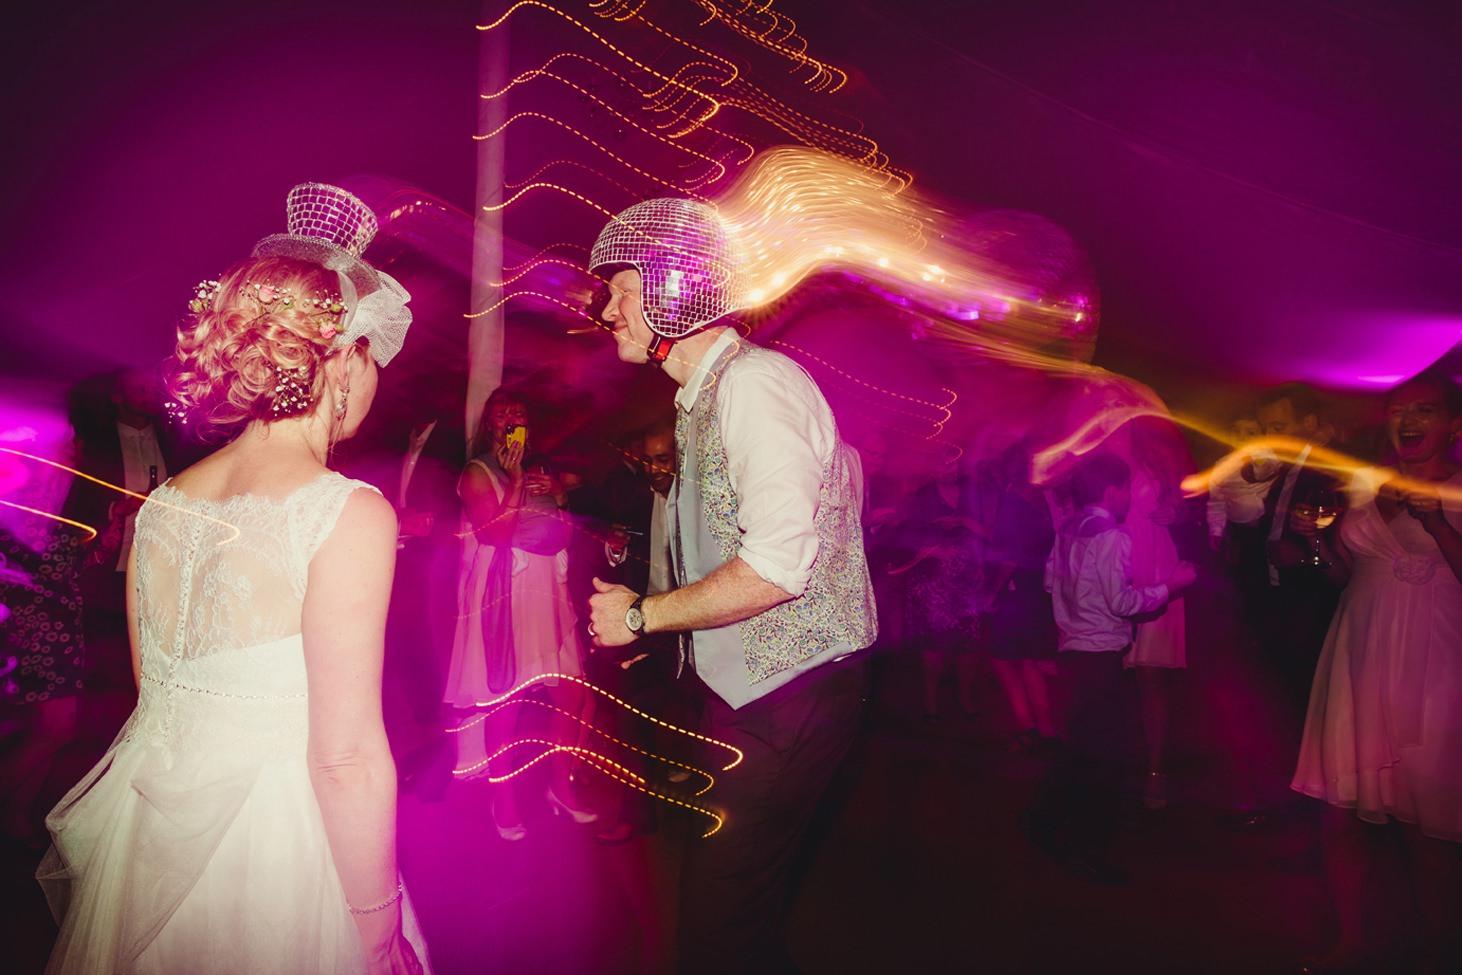 Bodleian library wedding bride and groom dancing